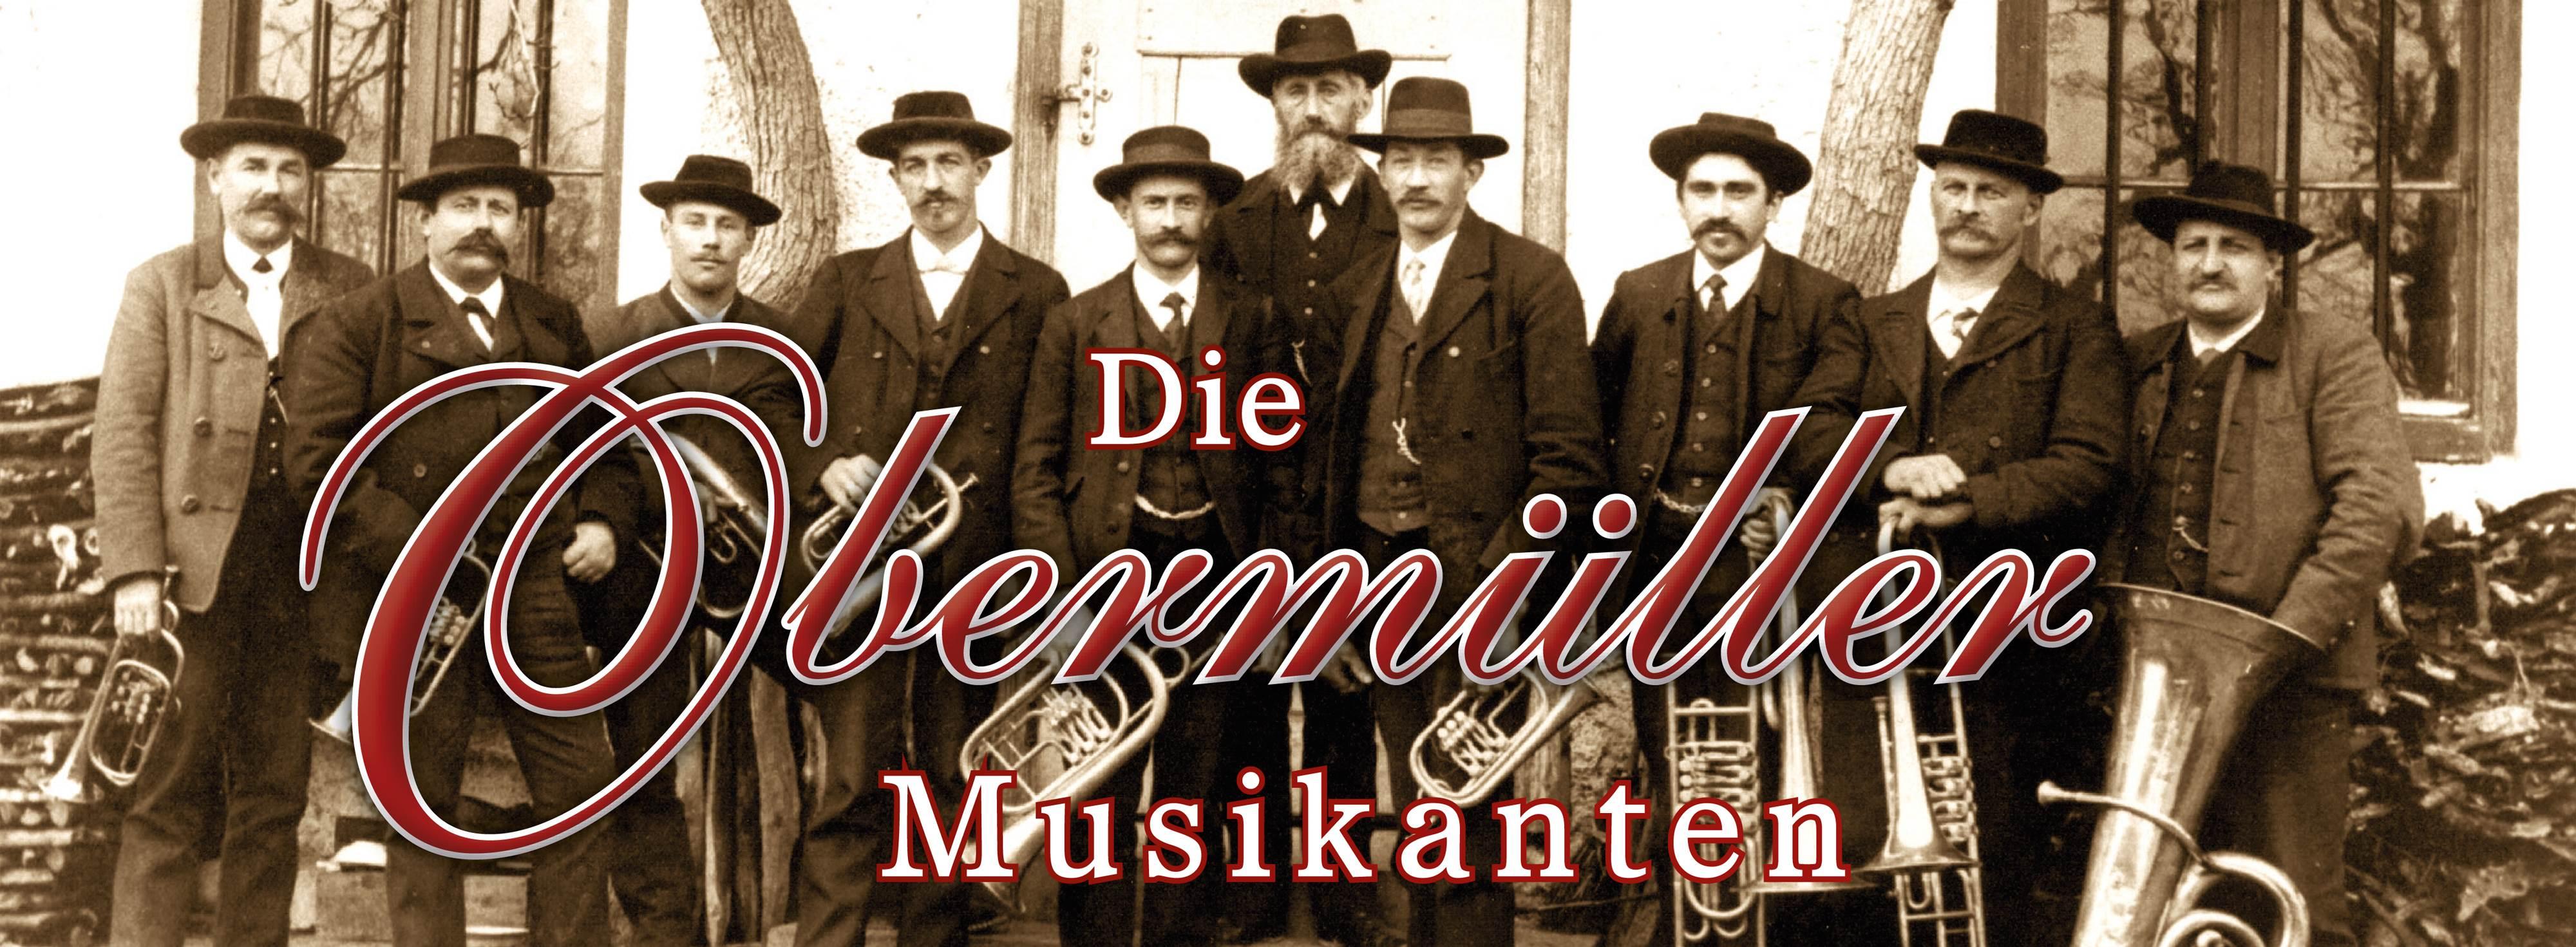 Obermüller M.